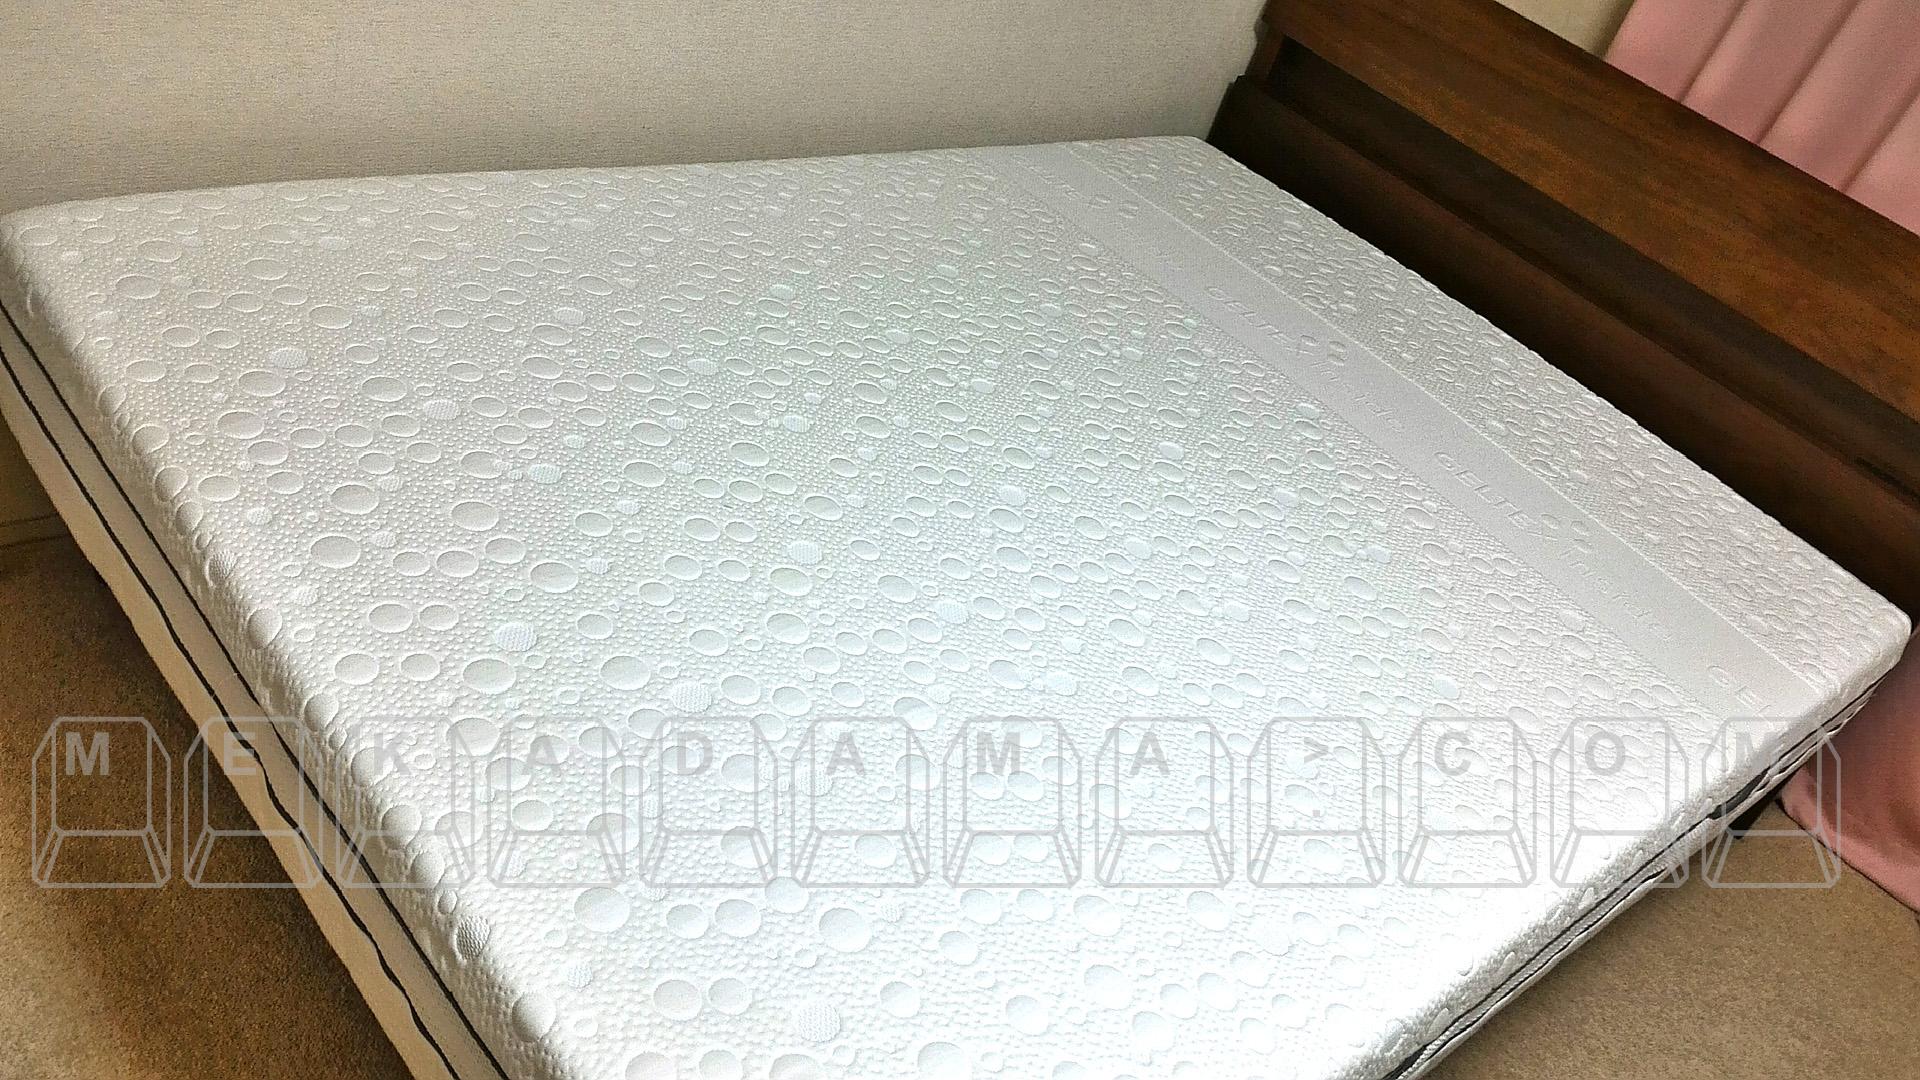 schlaraffia platin 240 amazing classic thermal foam x cm with schlaraffia platin 240 simple. Black Bedroom Furniture Sets. Home Design Ideas